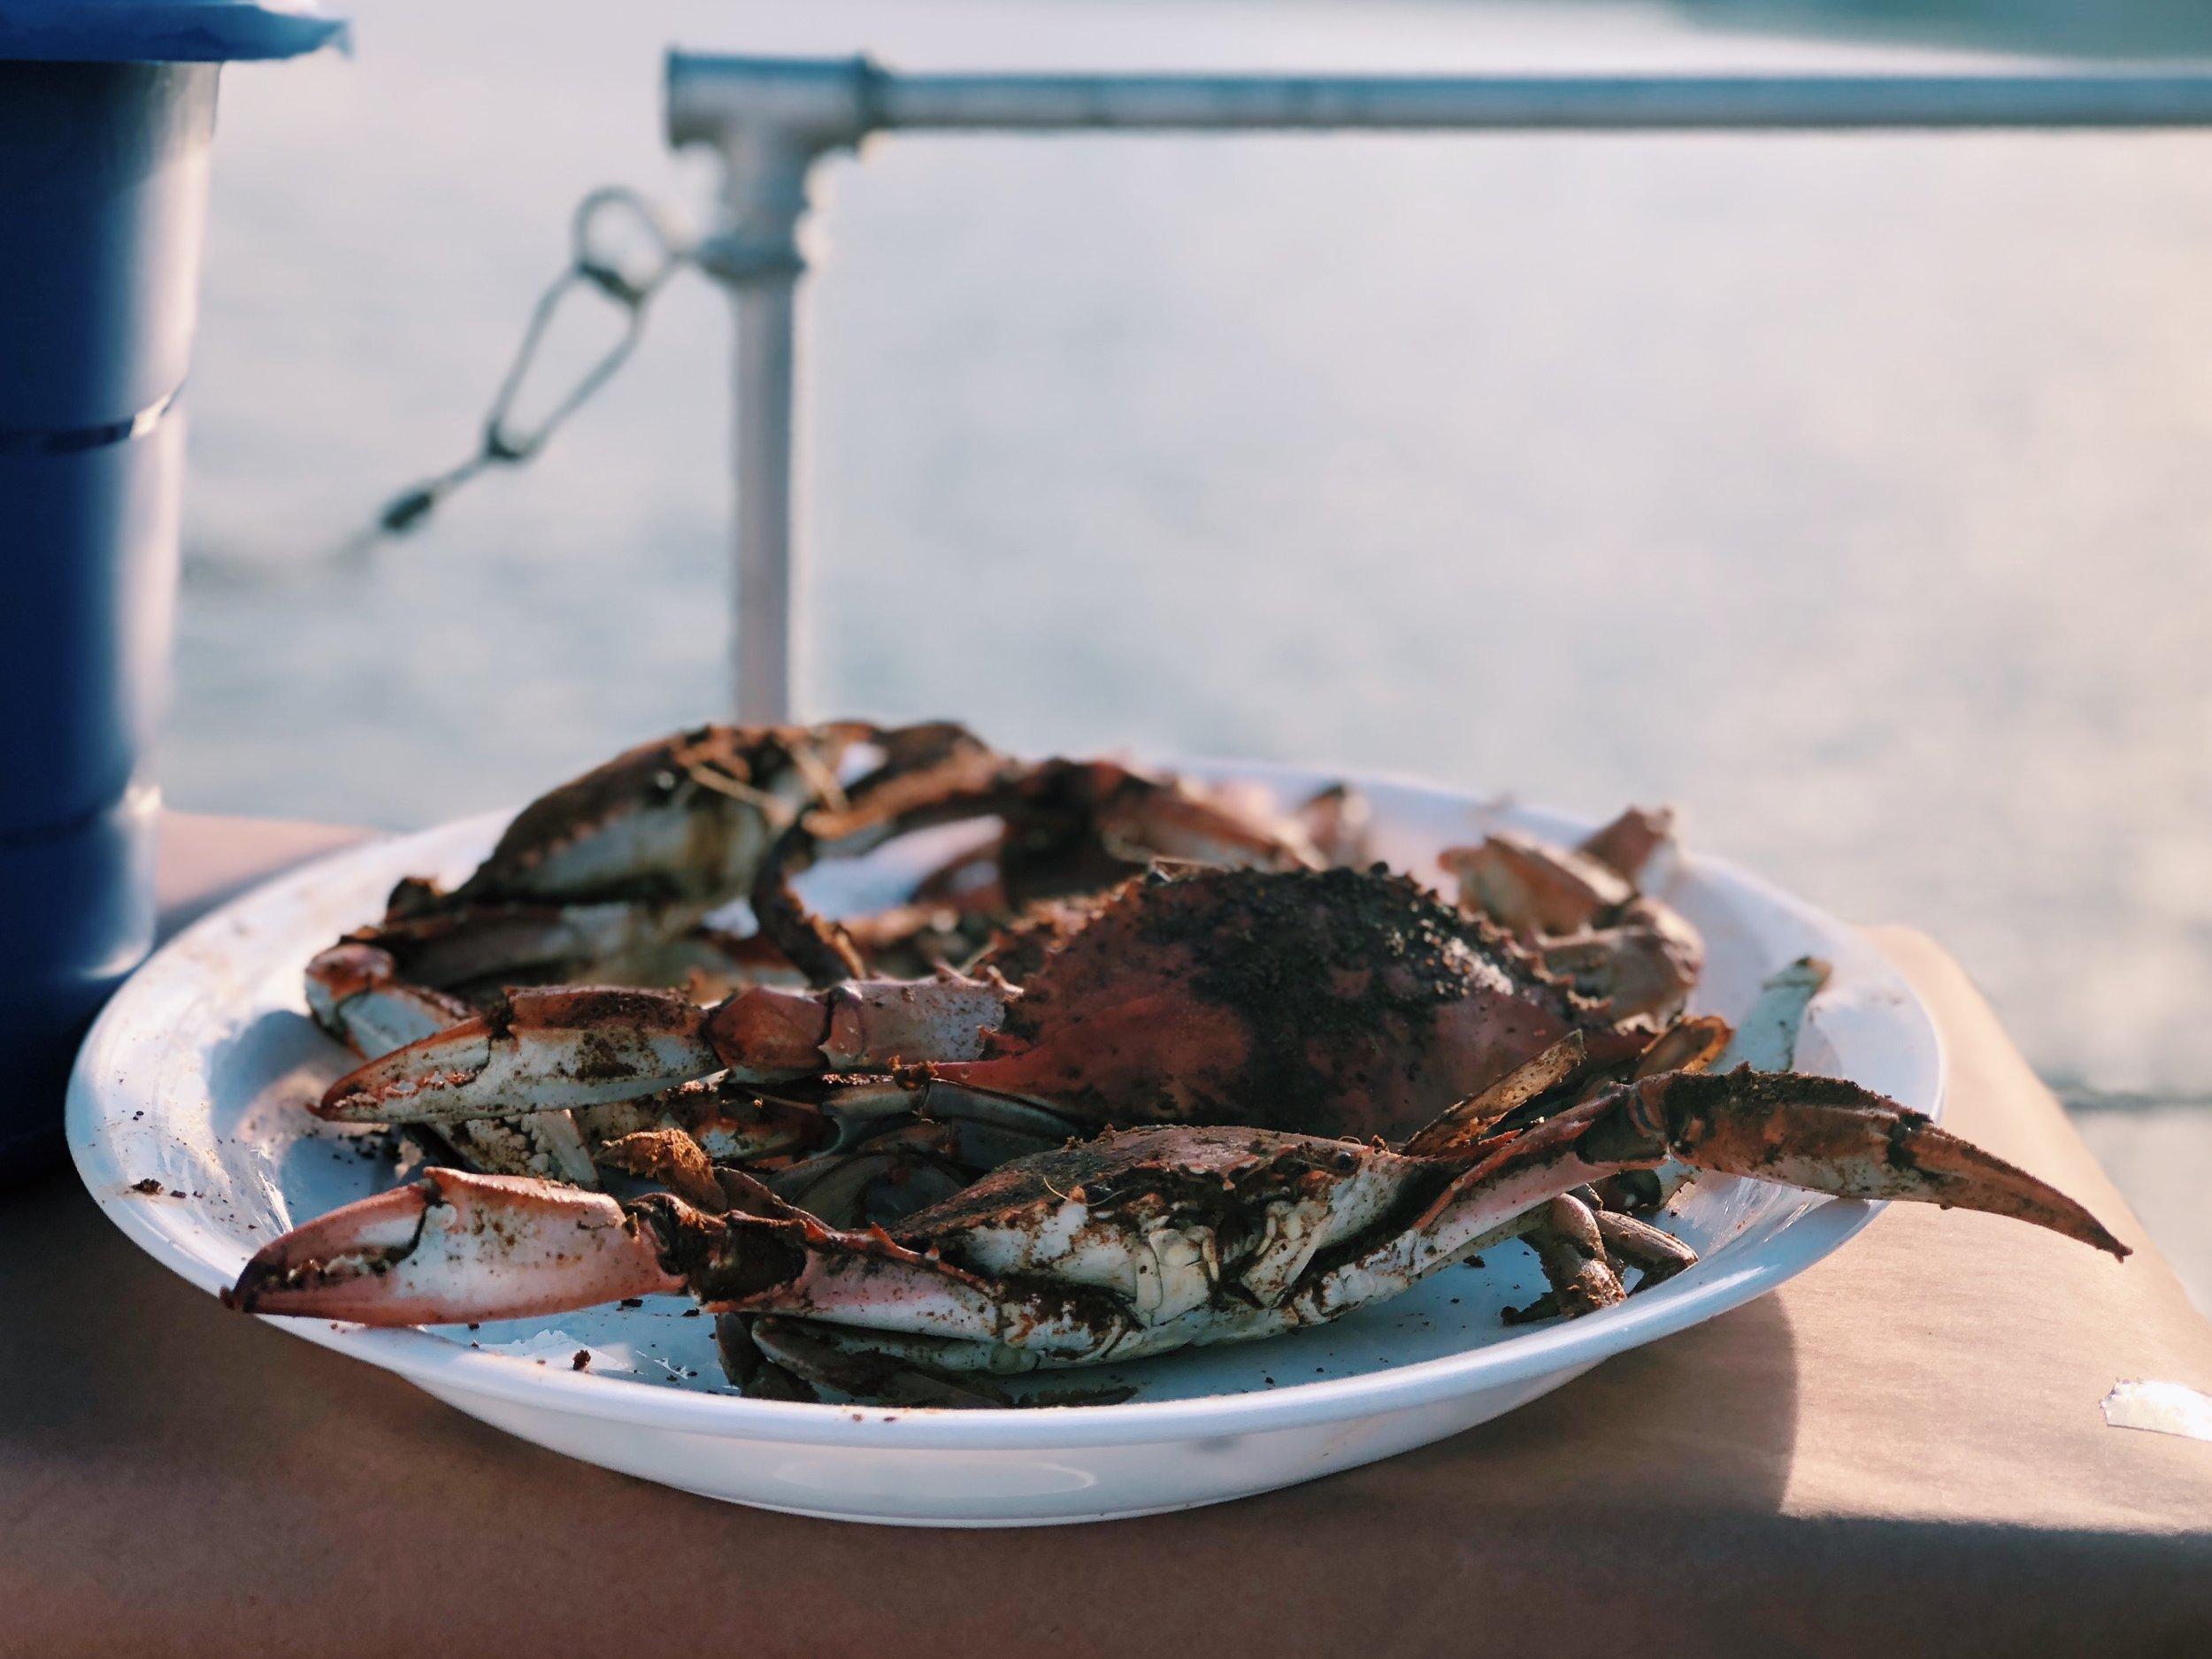 Crab feasts. YUM. Source: www.halfshelladventures.com